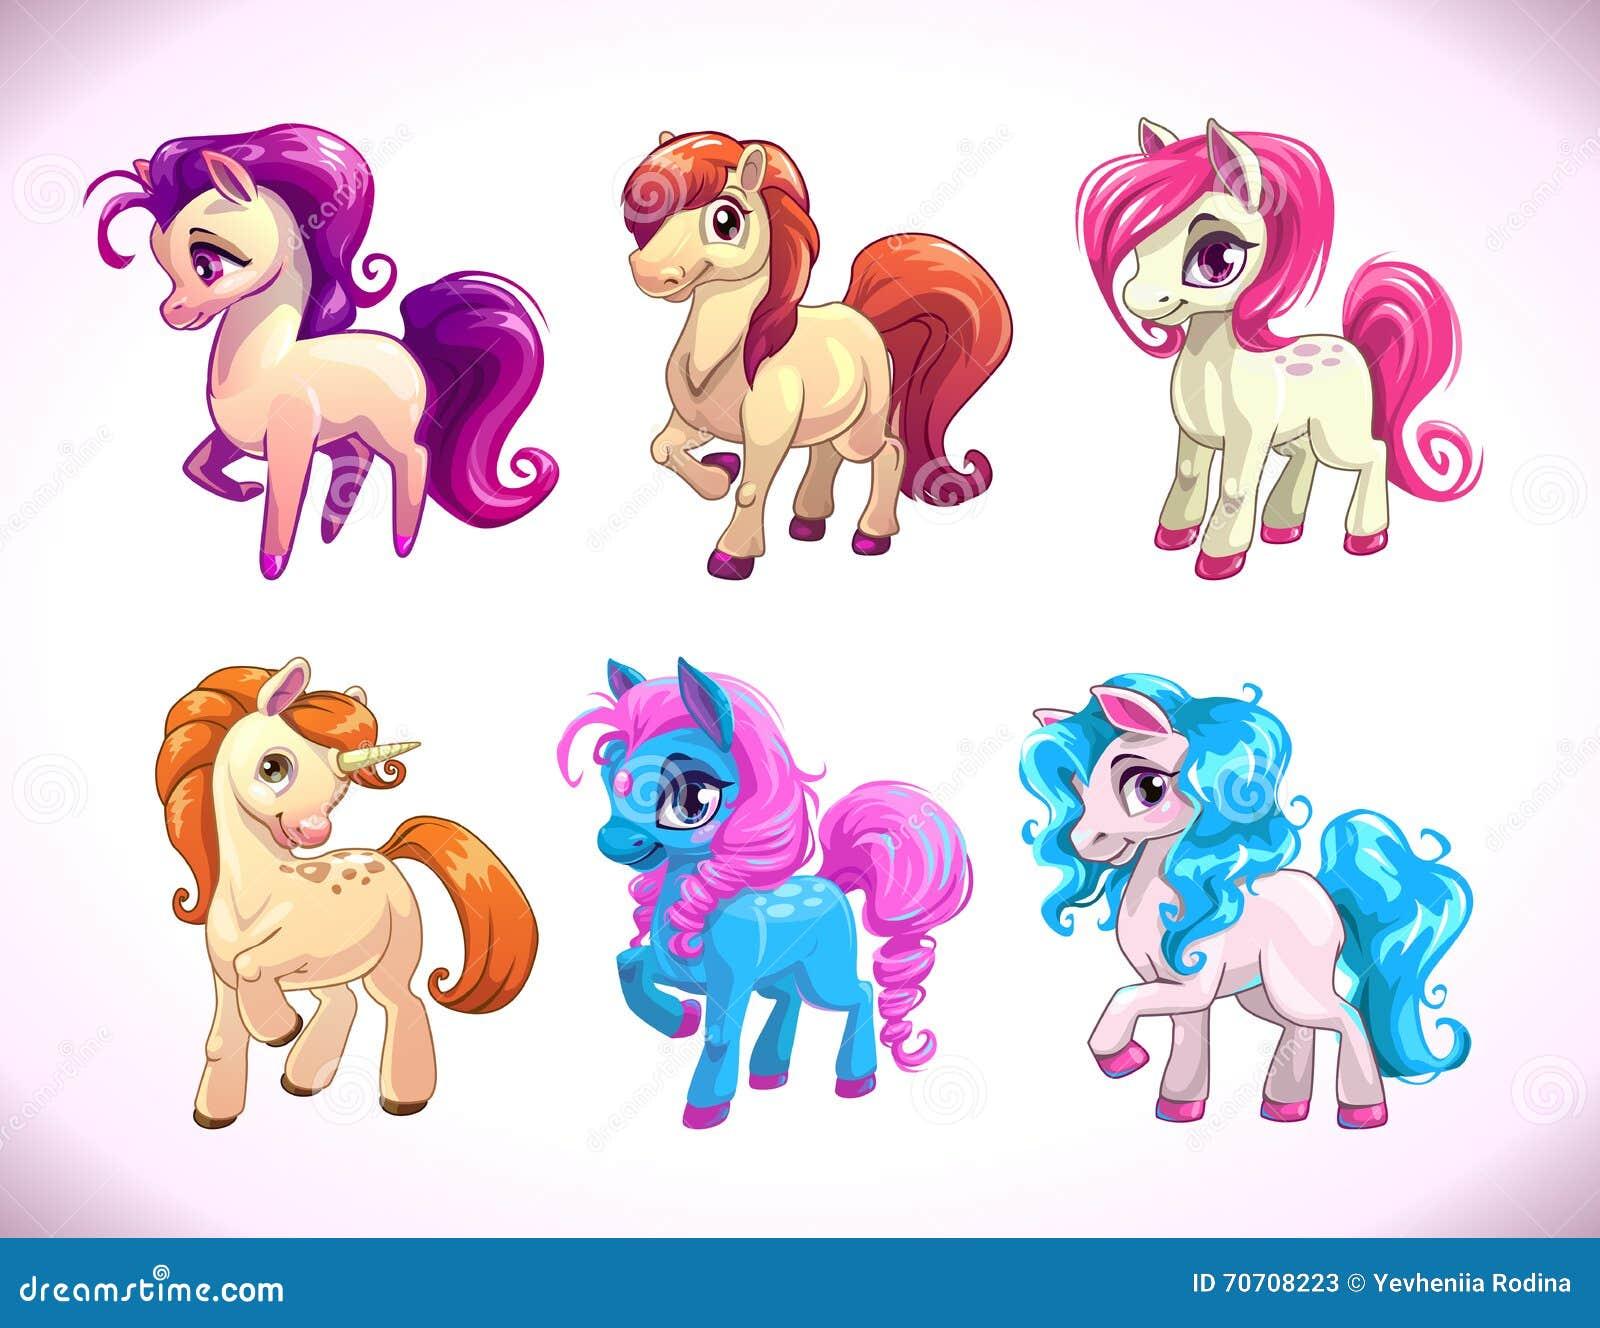 Funny Cartoon Horse Characters Stock Vector Illustration Of Pretty Animal 70708223